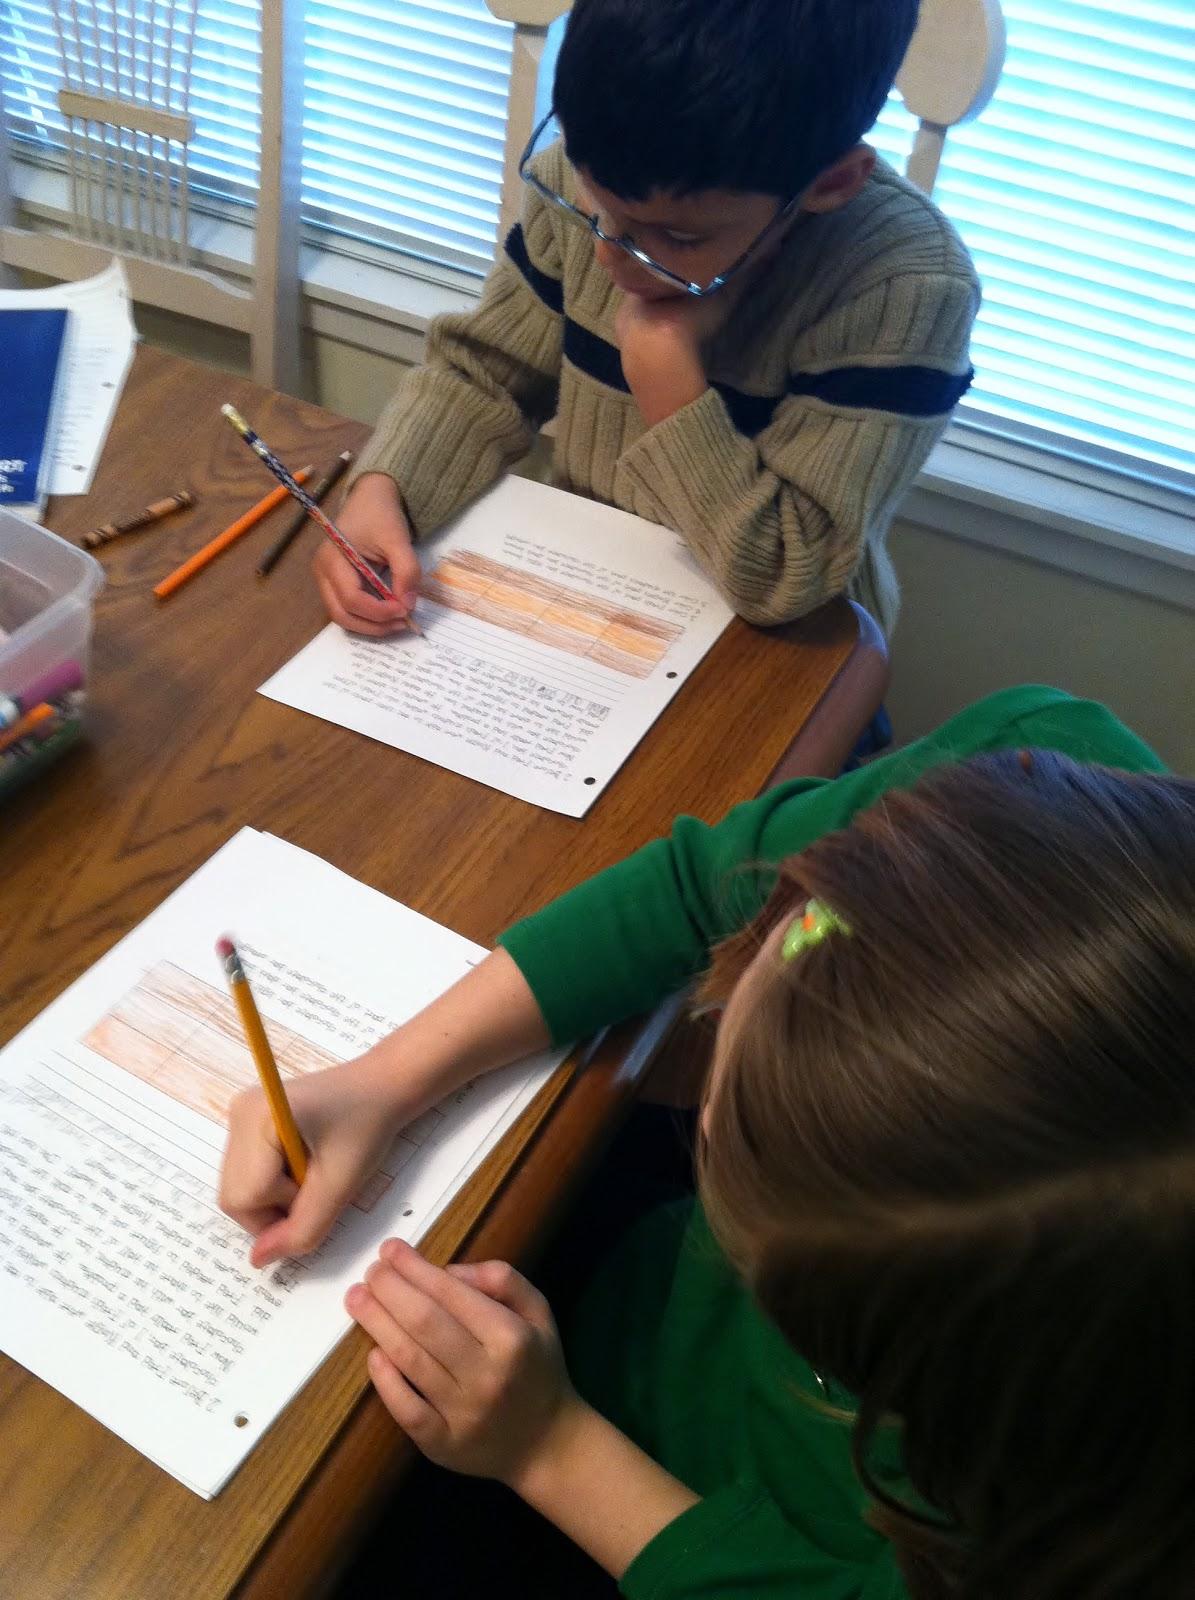 Noahs Ark Homeschool Academy Life Of Fred Apples